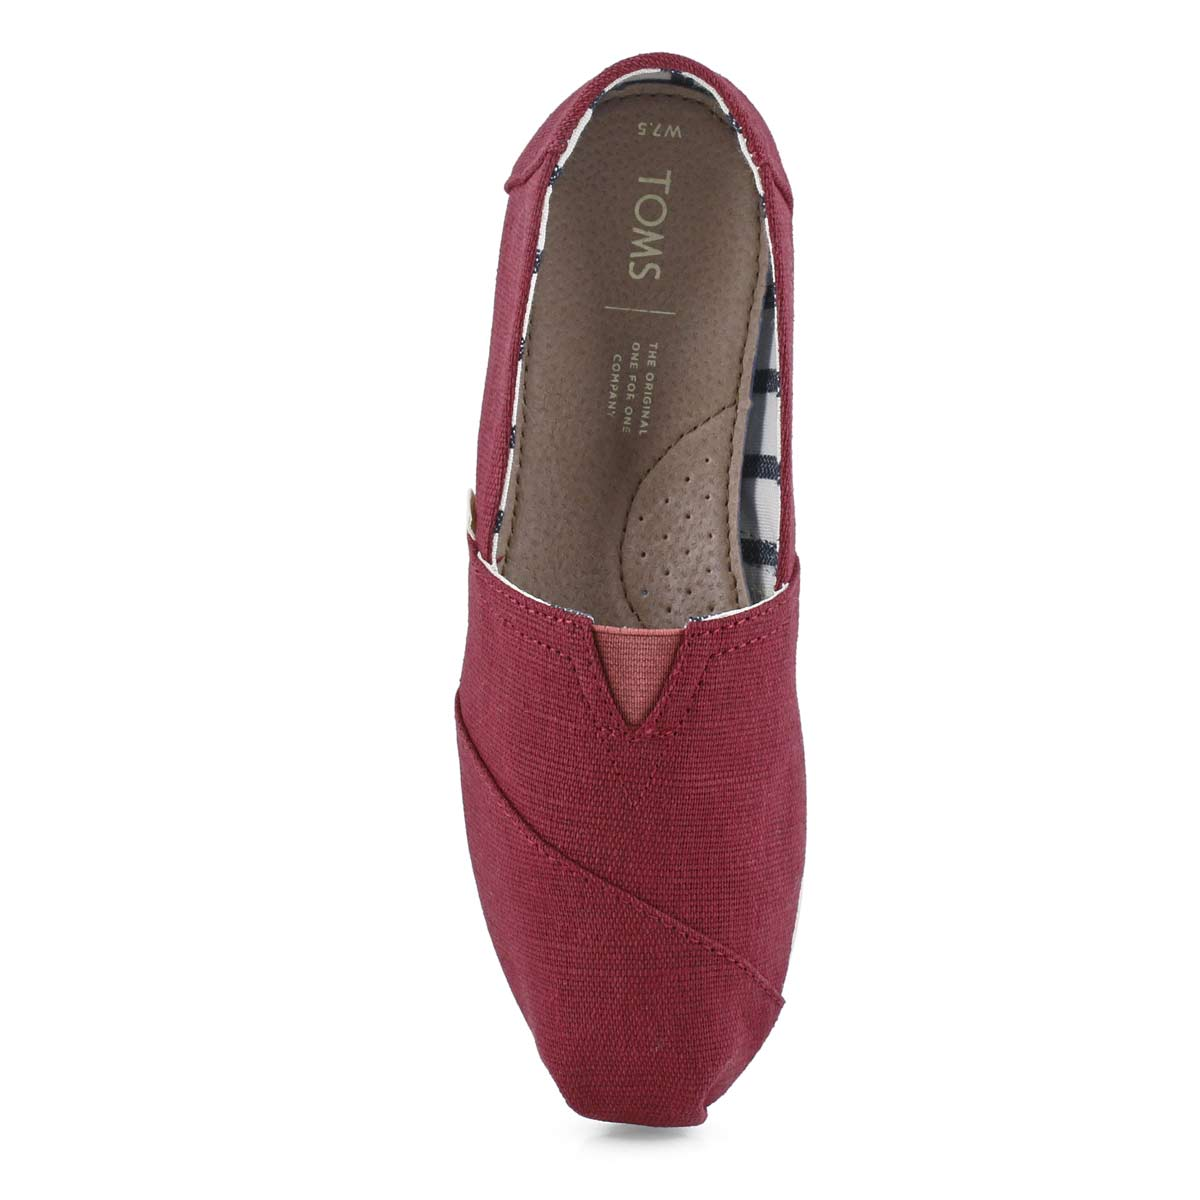 Lds Venice blk cherry Canvas loafer